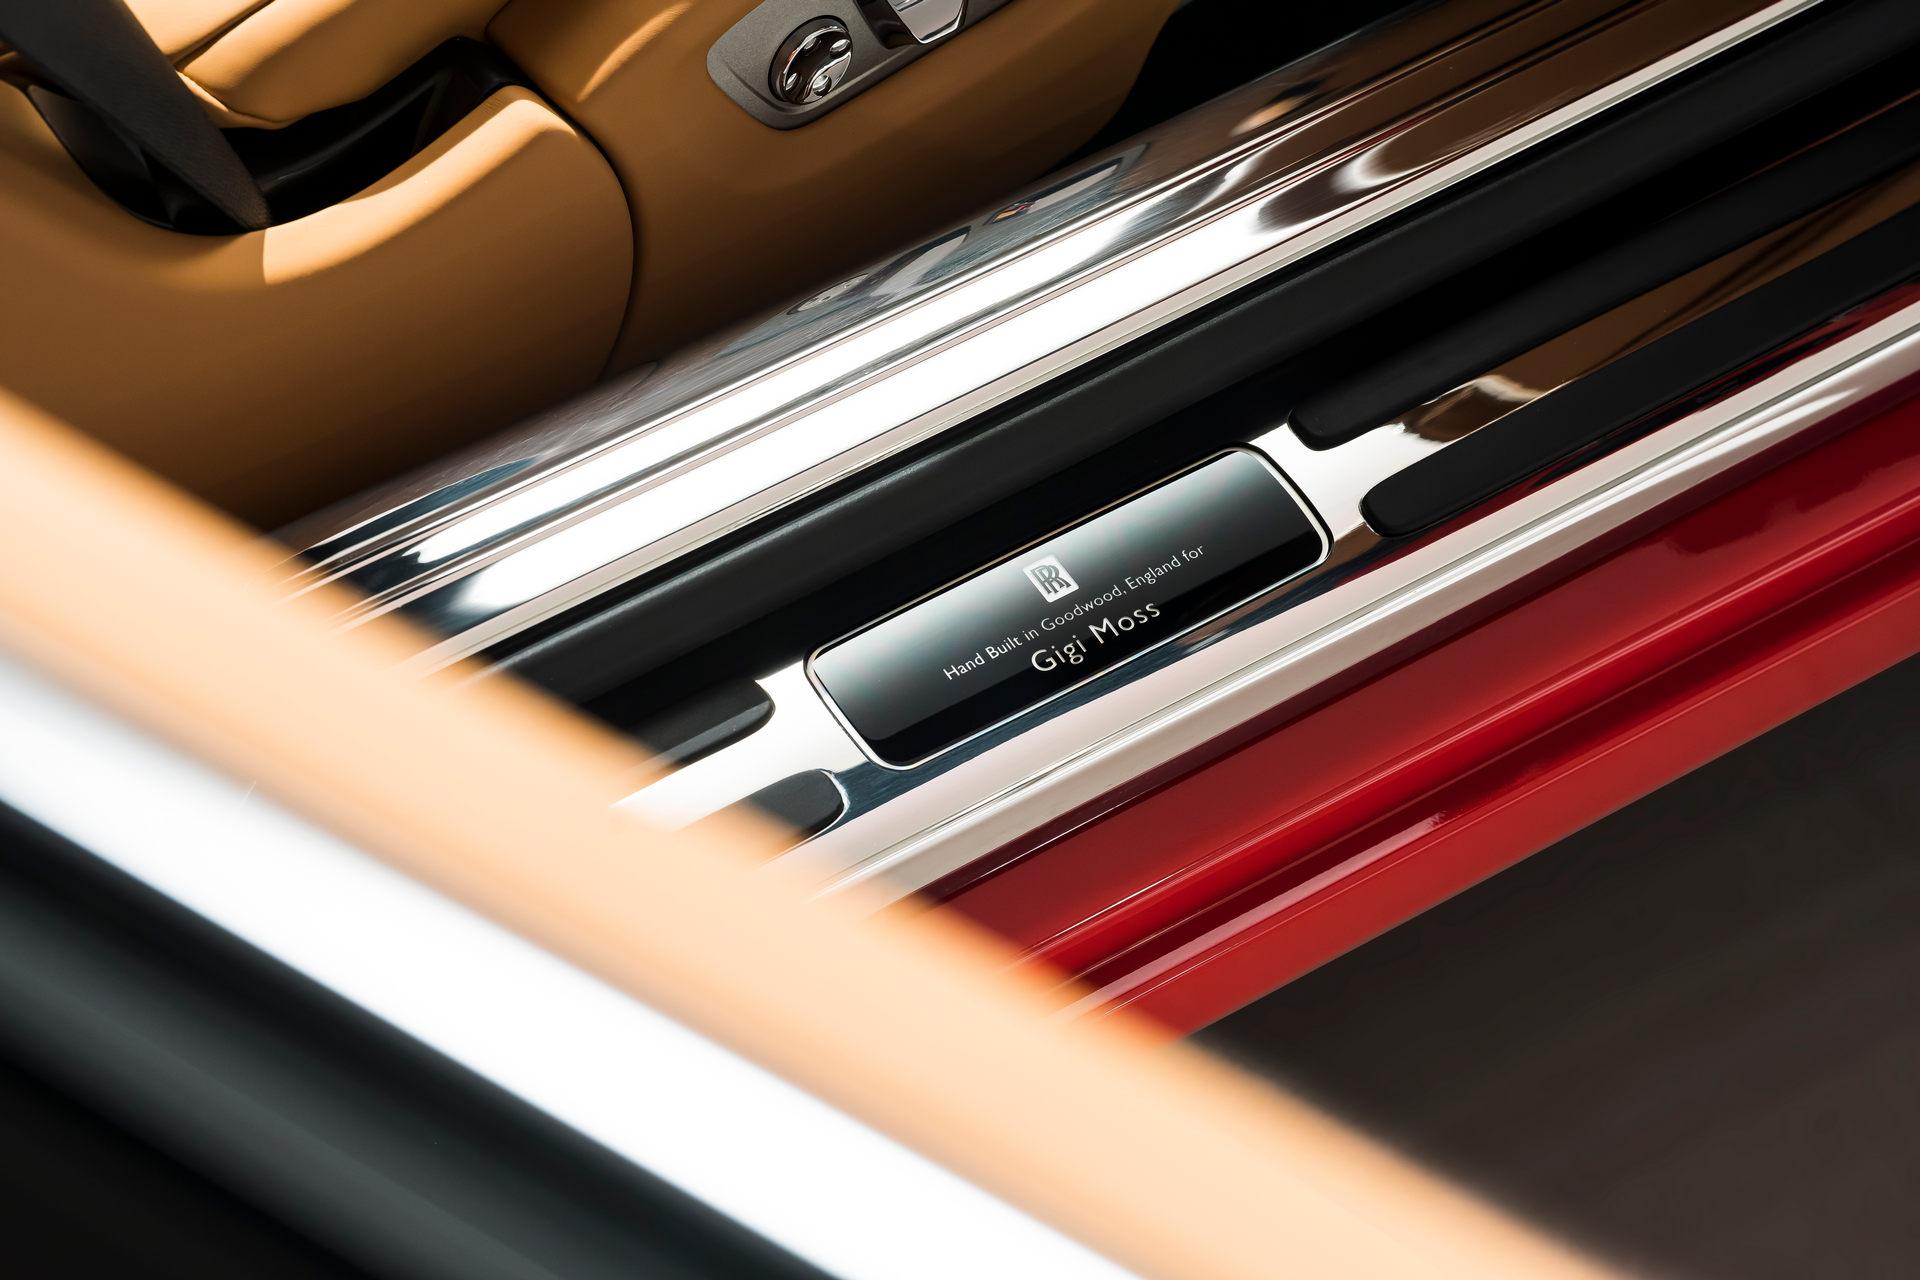 Bespoke-Rolls-Royce-Phantom-and-Dawn-13